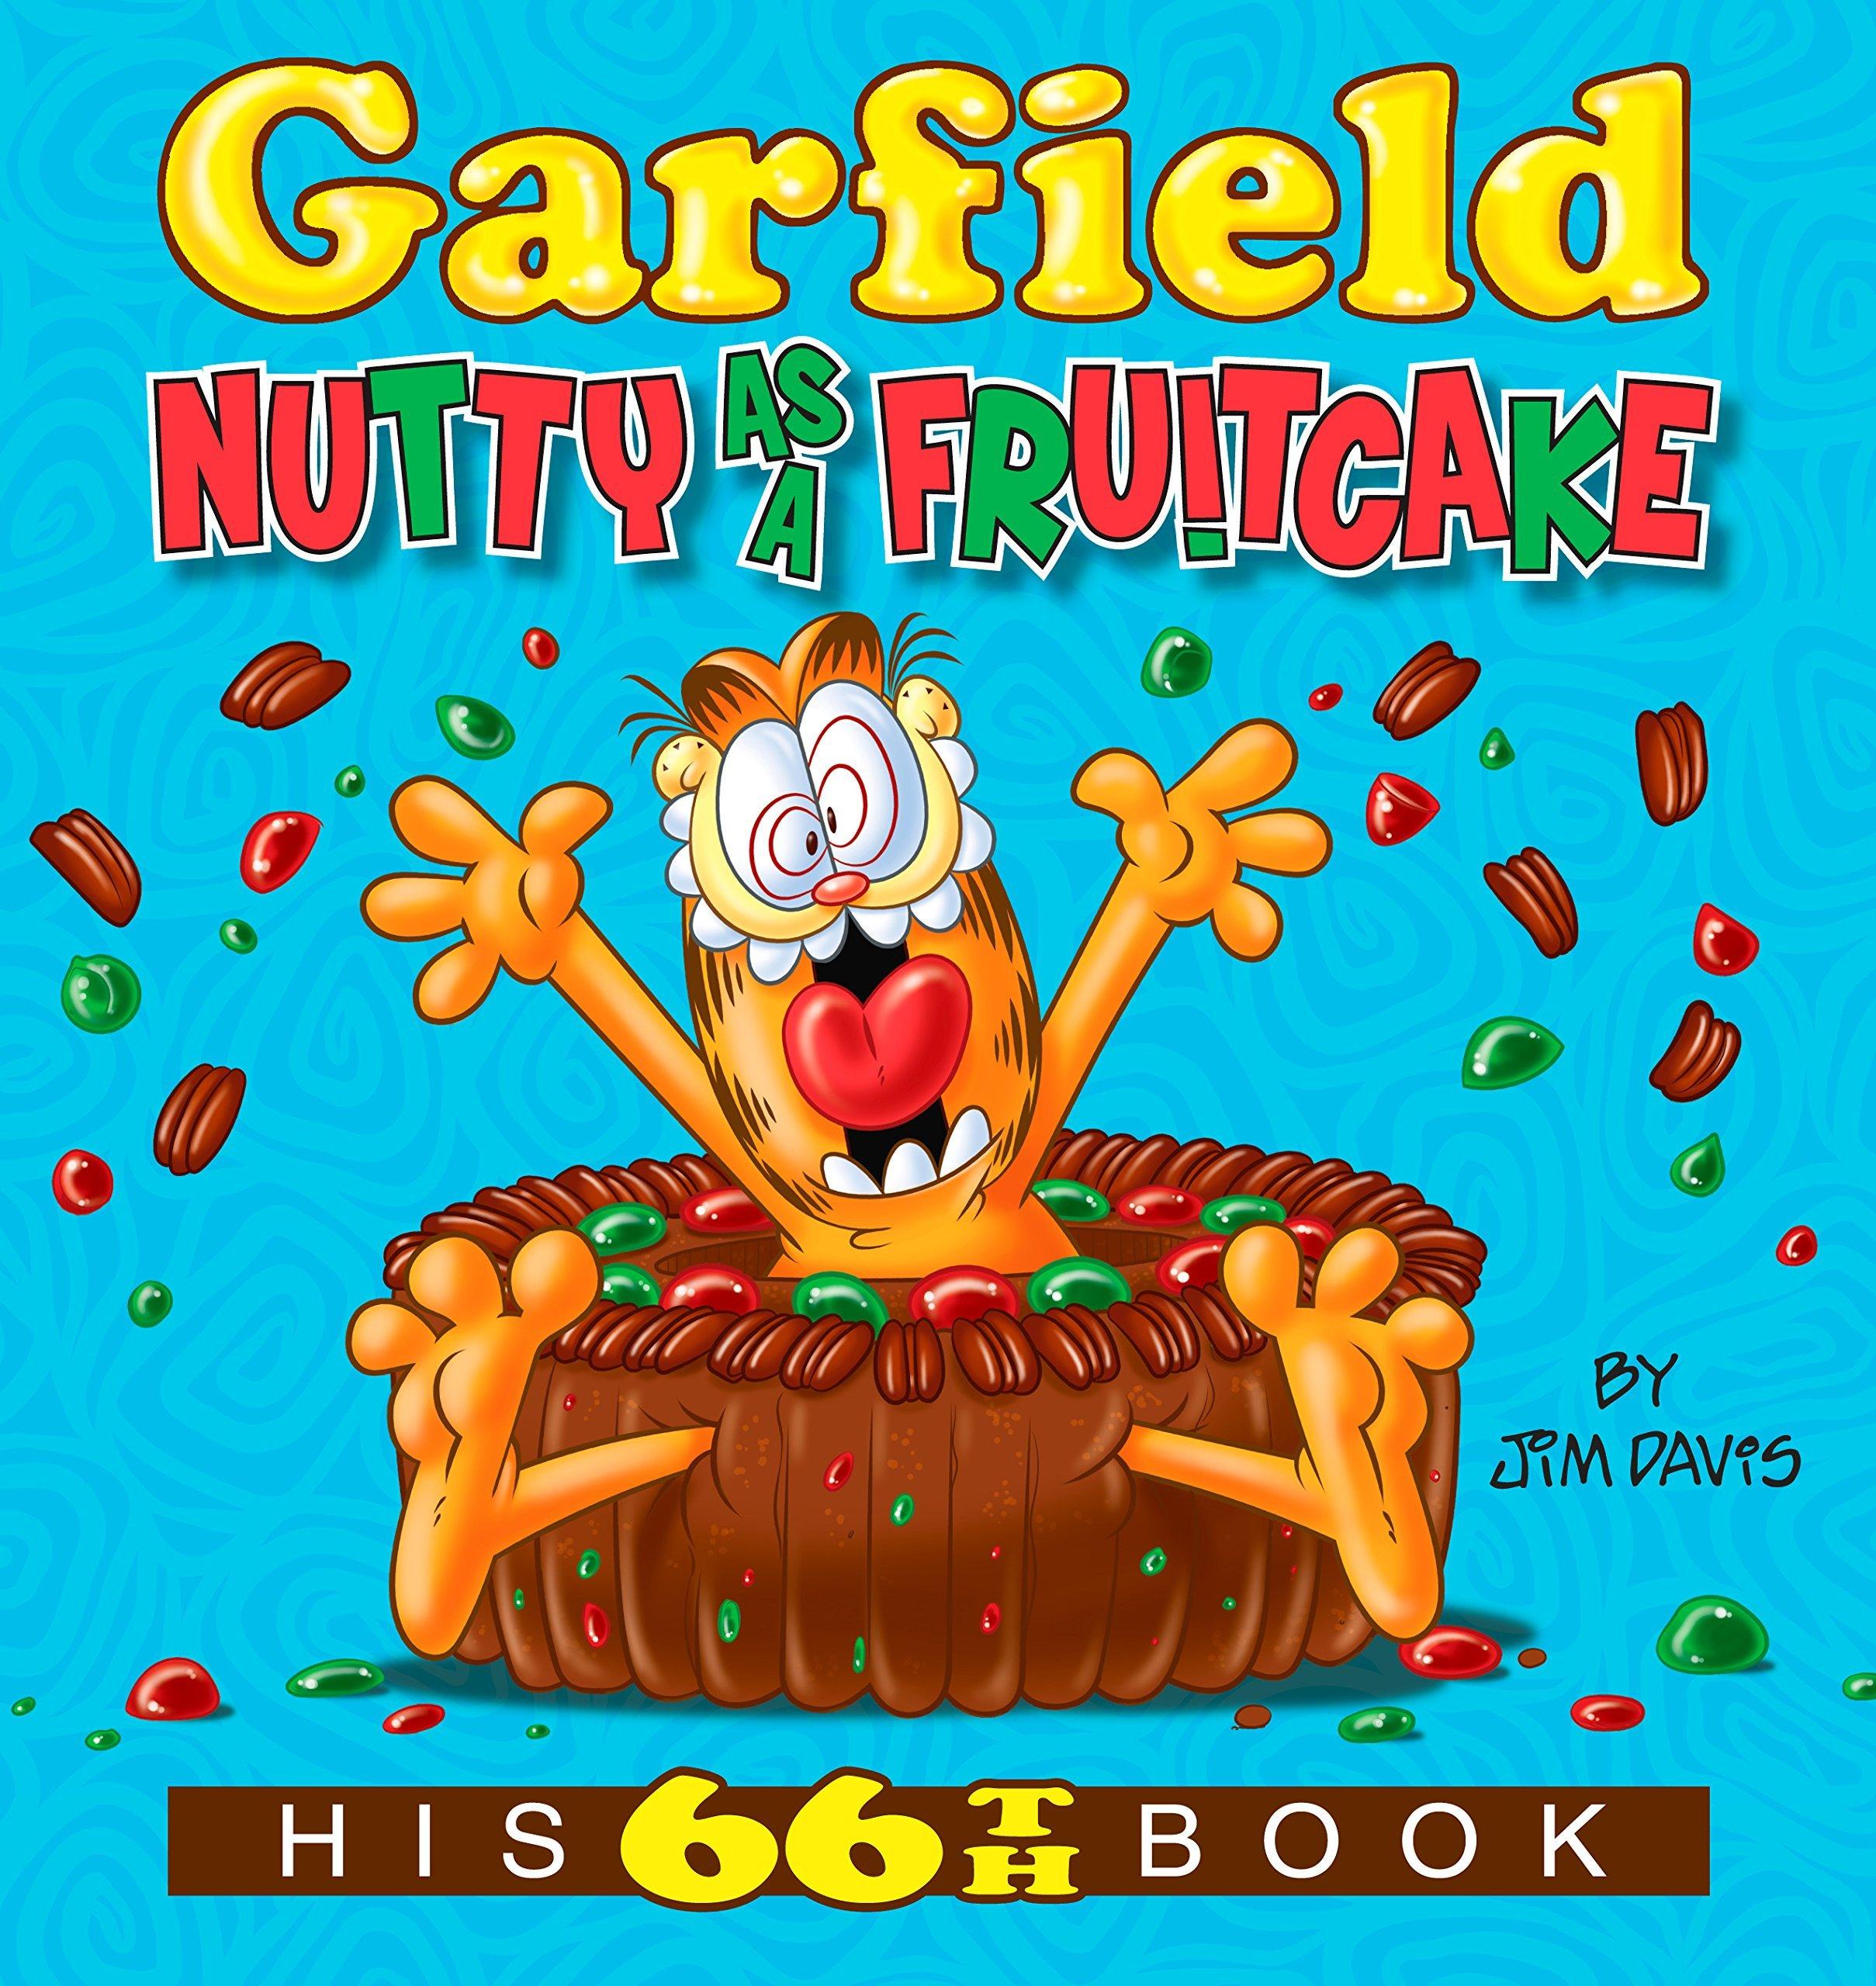 Garfield Nutty as a Fruitcake: His 66th Book